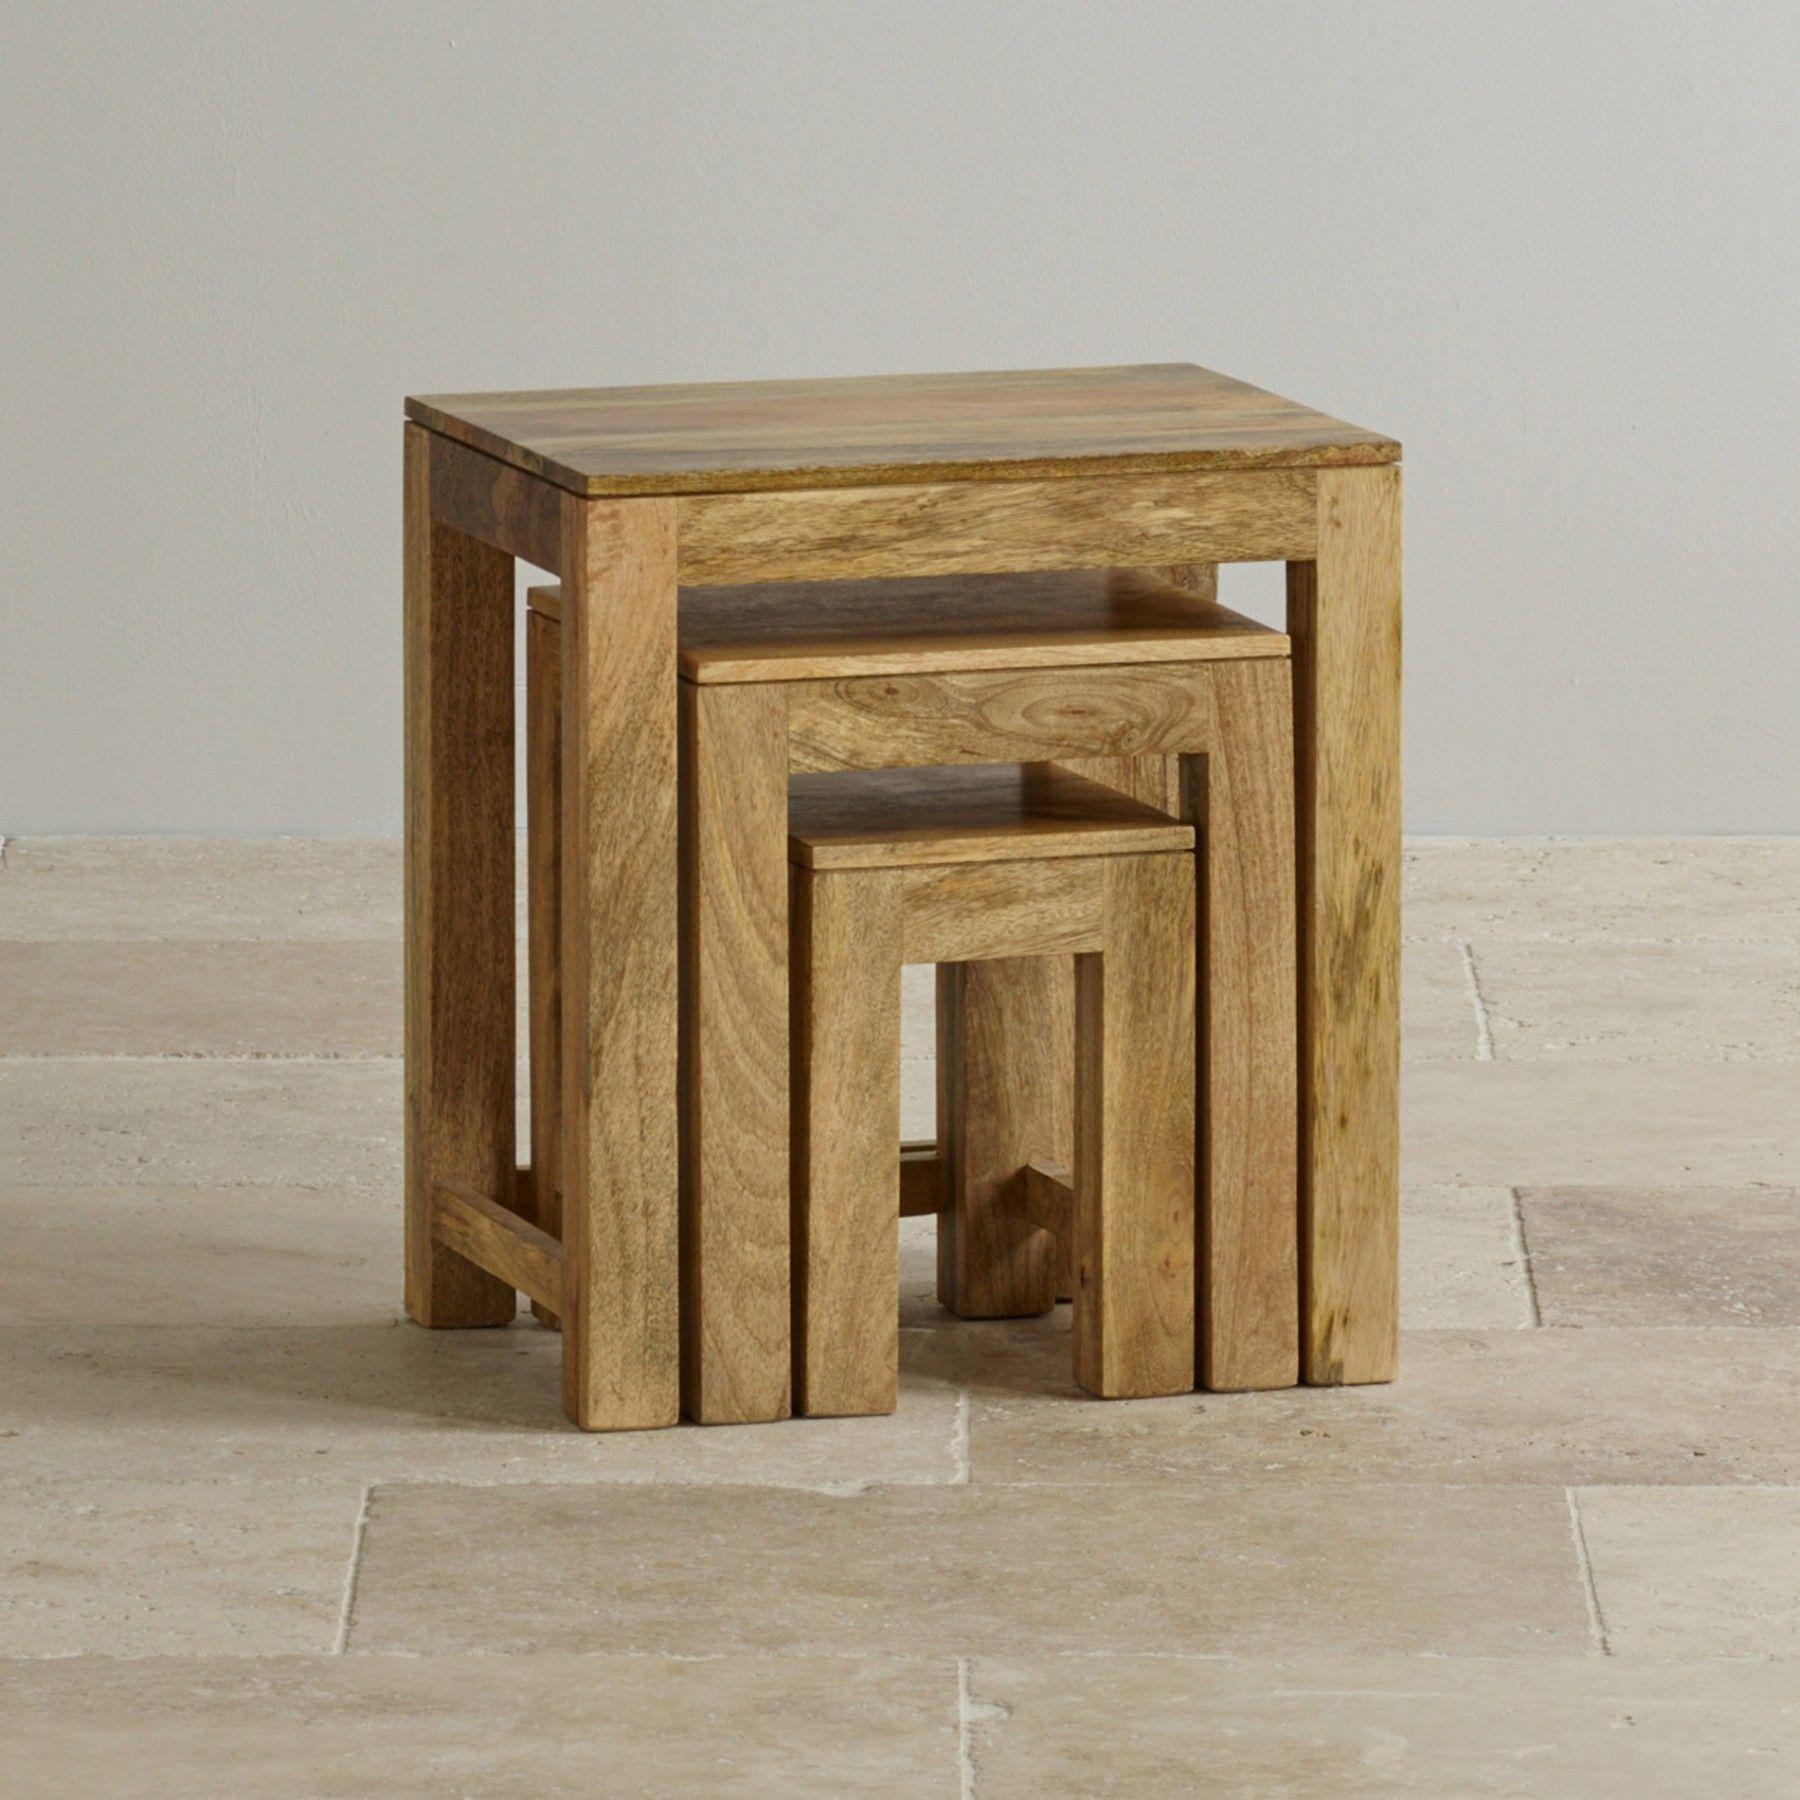 Dakota Dark Mango Large Coffee Table With Baskets Coffee Table Large Coffee Tables Coffee Table With Baskets [ 1000 x 1498 Pixel ]